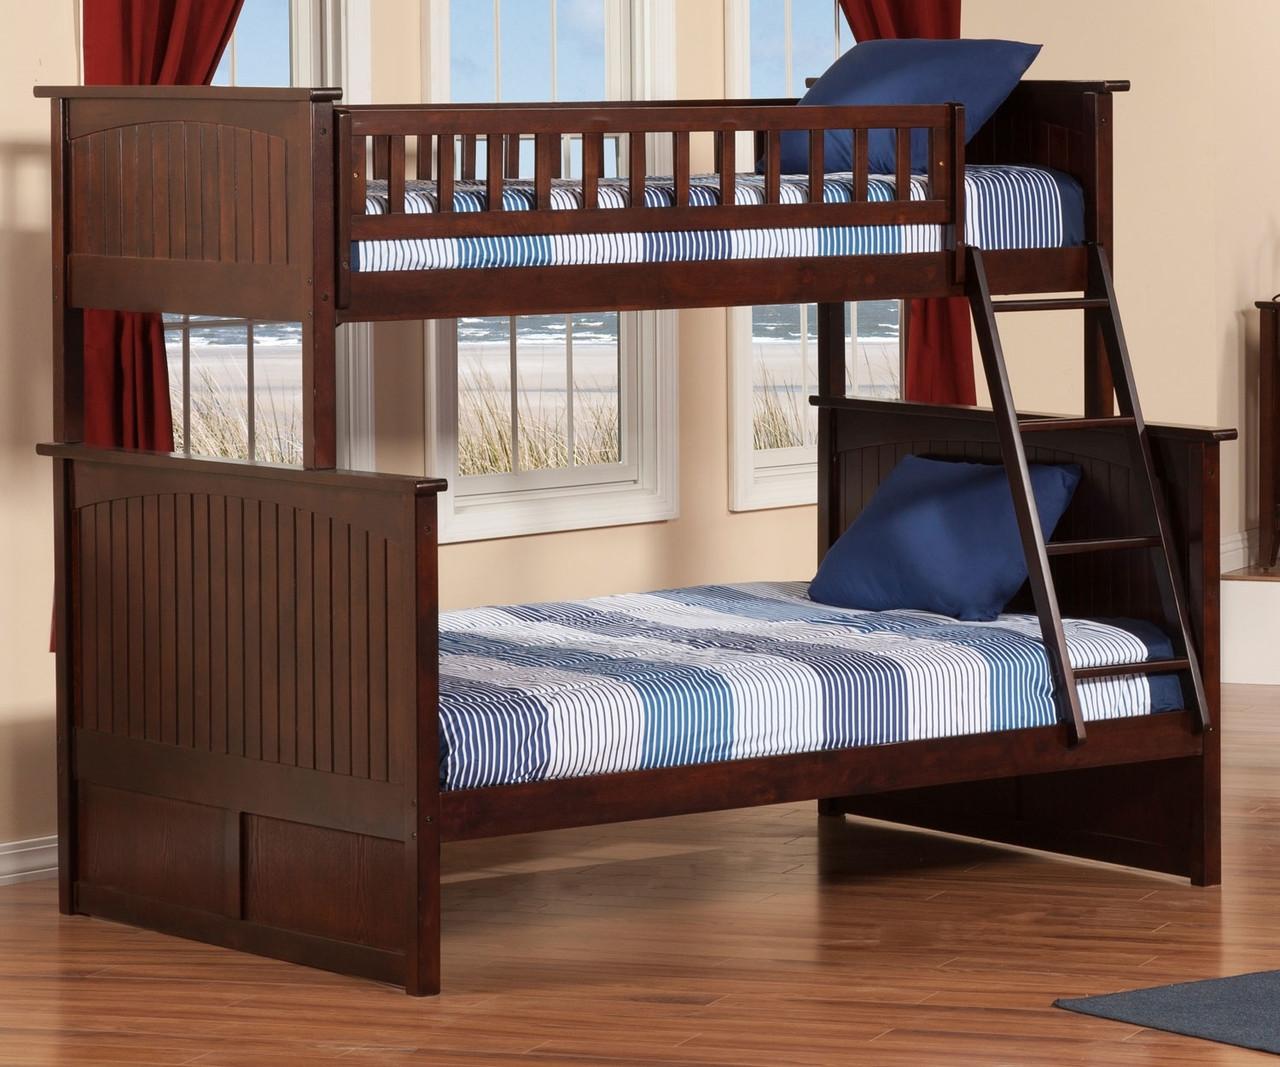 nantucket twin over full bunk bed ab59204 atlantic furniture solid wood bedroom furniture in. Black Bedroom Furniture Sets. Home Design Ideas